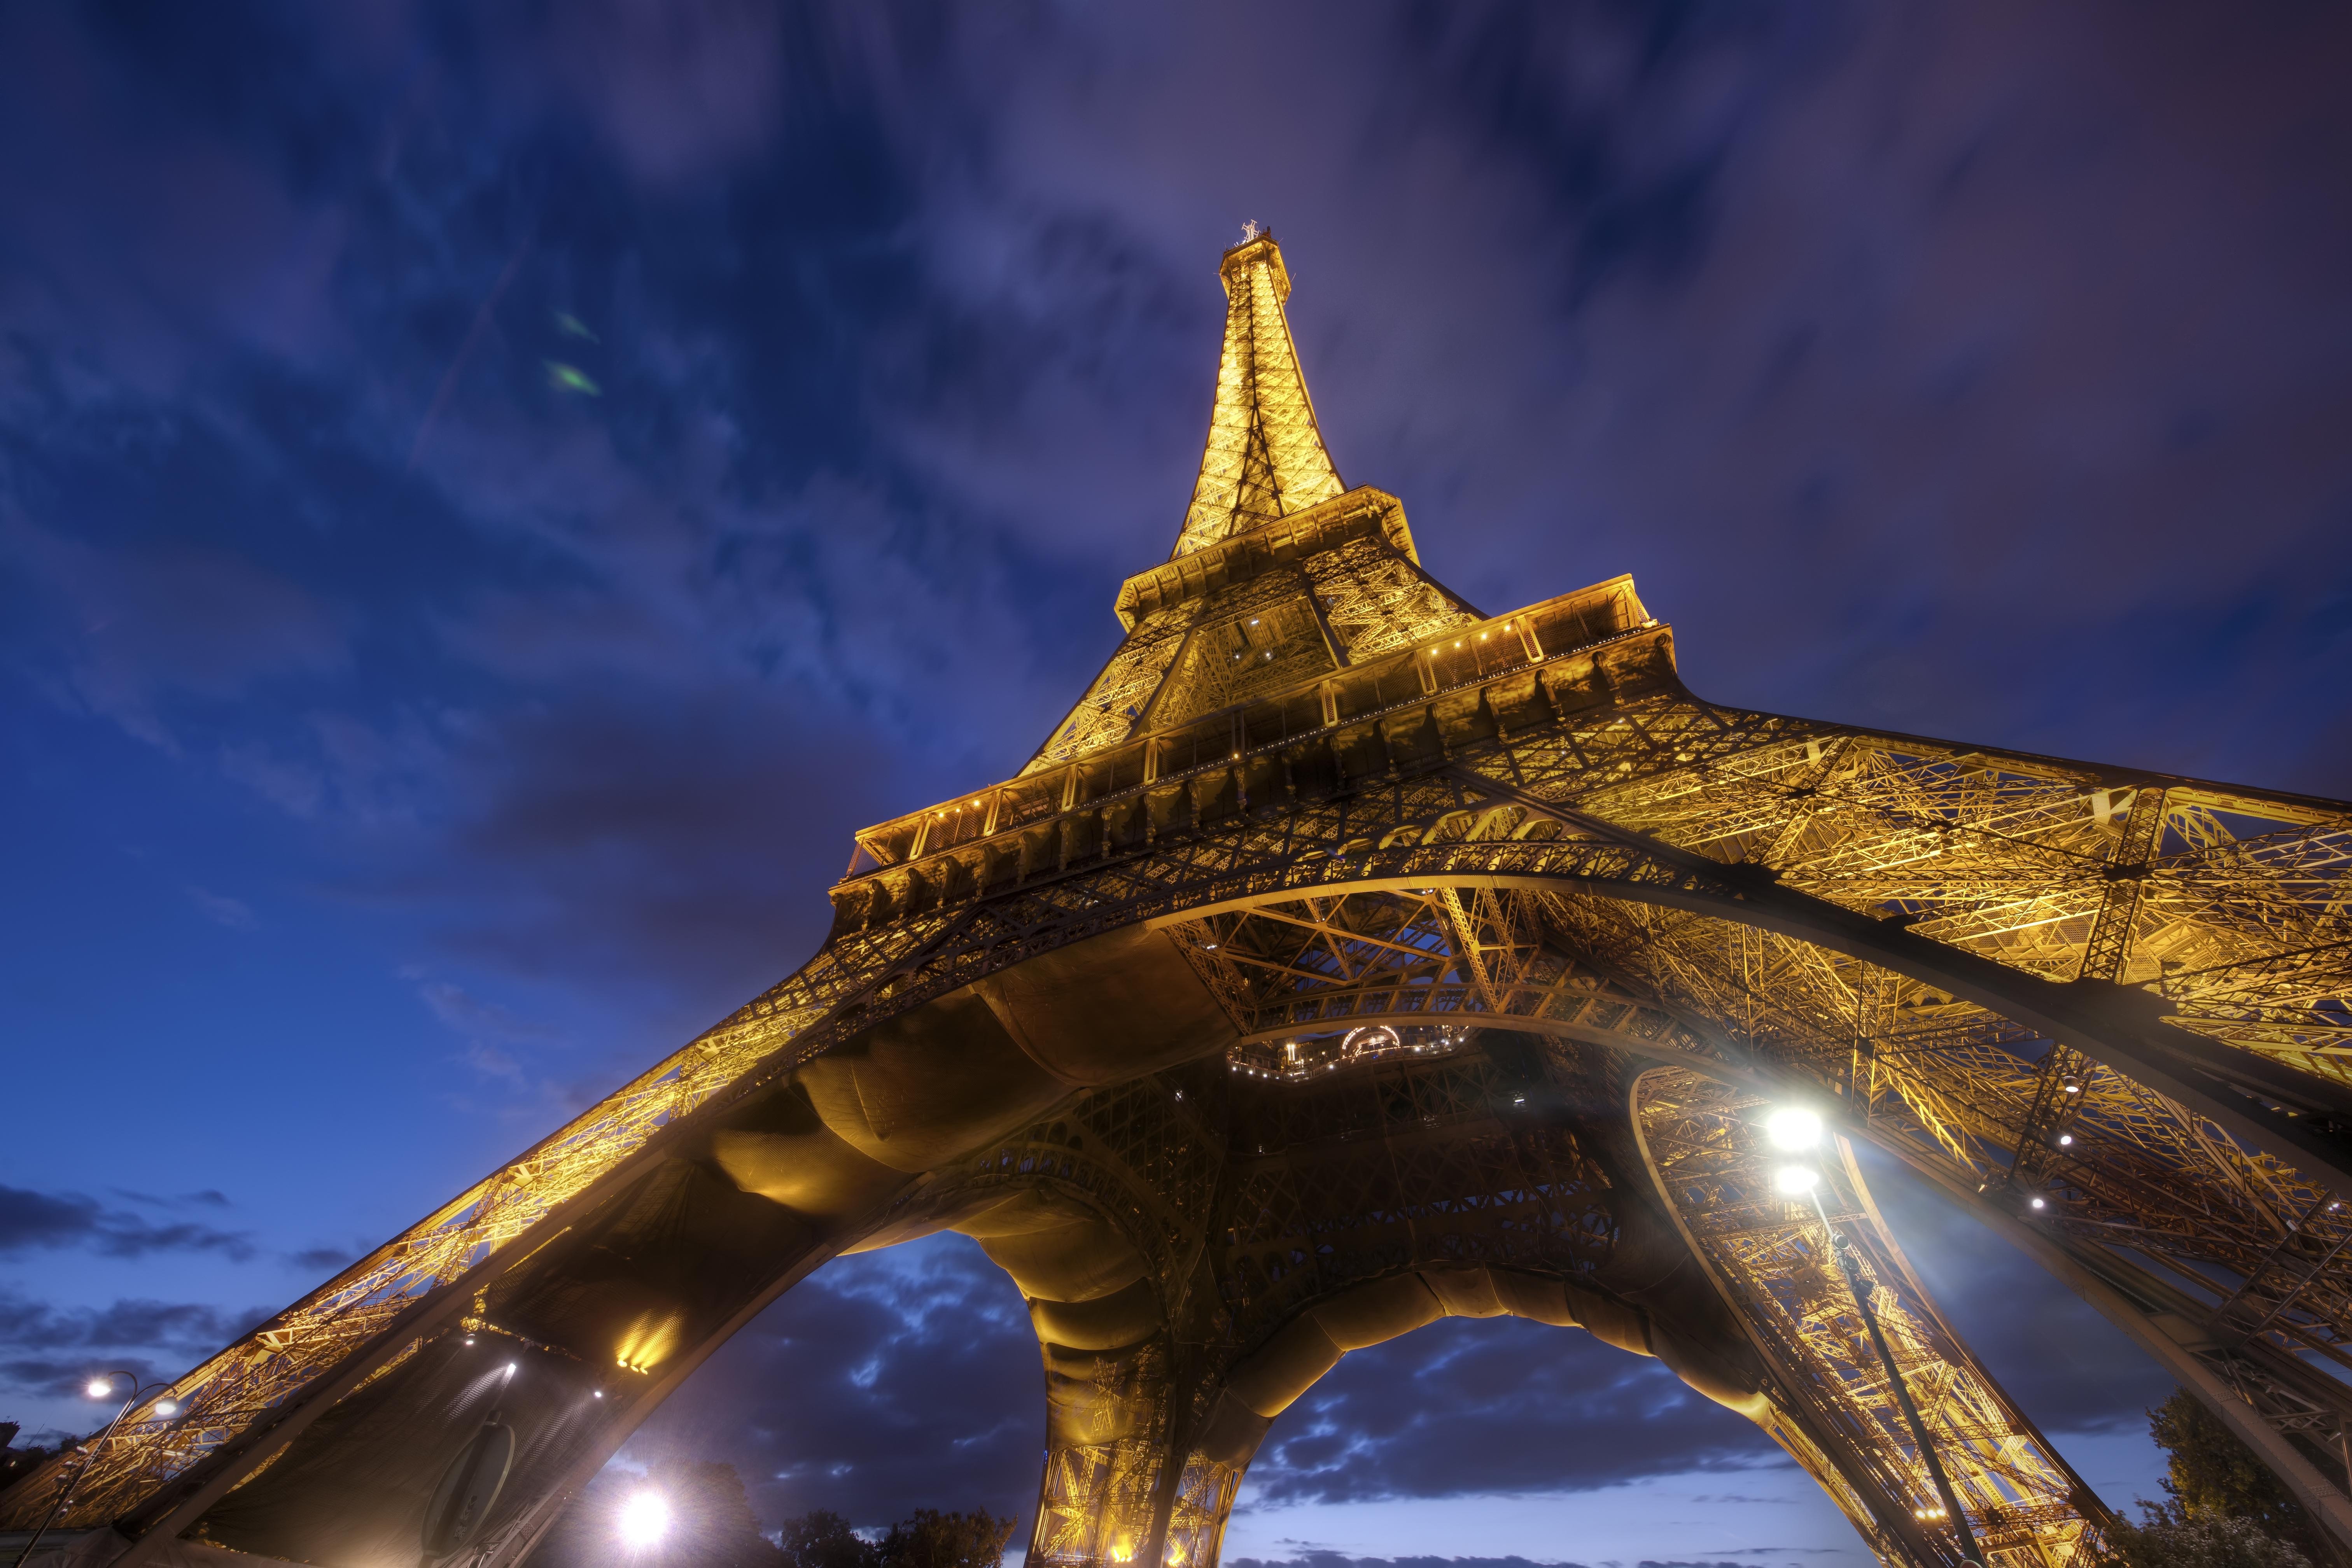 Eiffel Tower 4k Wallpaper Paris Lights Sky View Clouds Iconic Metal Structure 5k World 2135